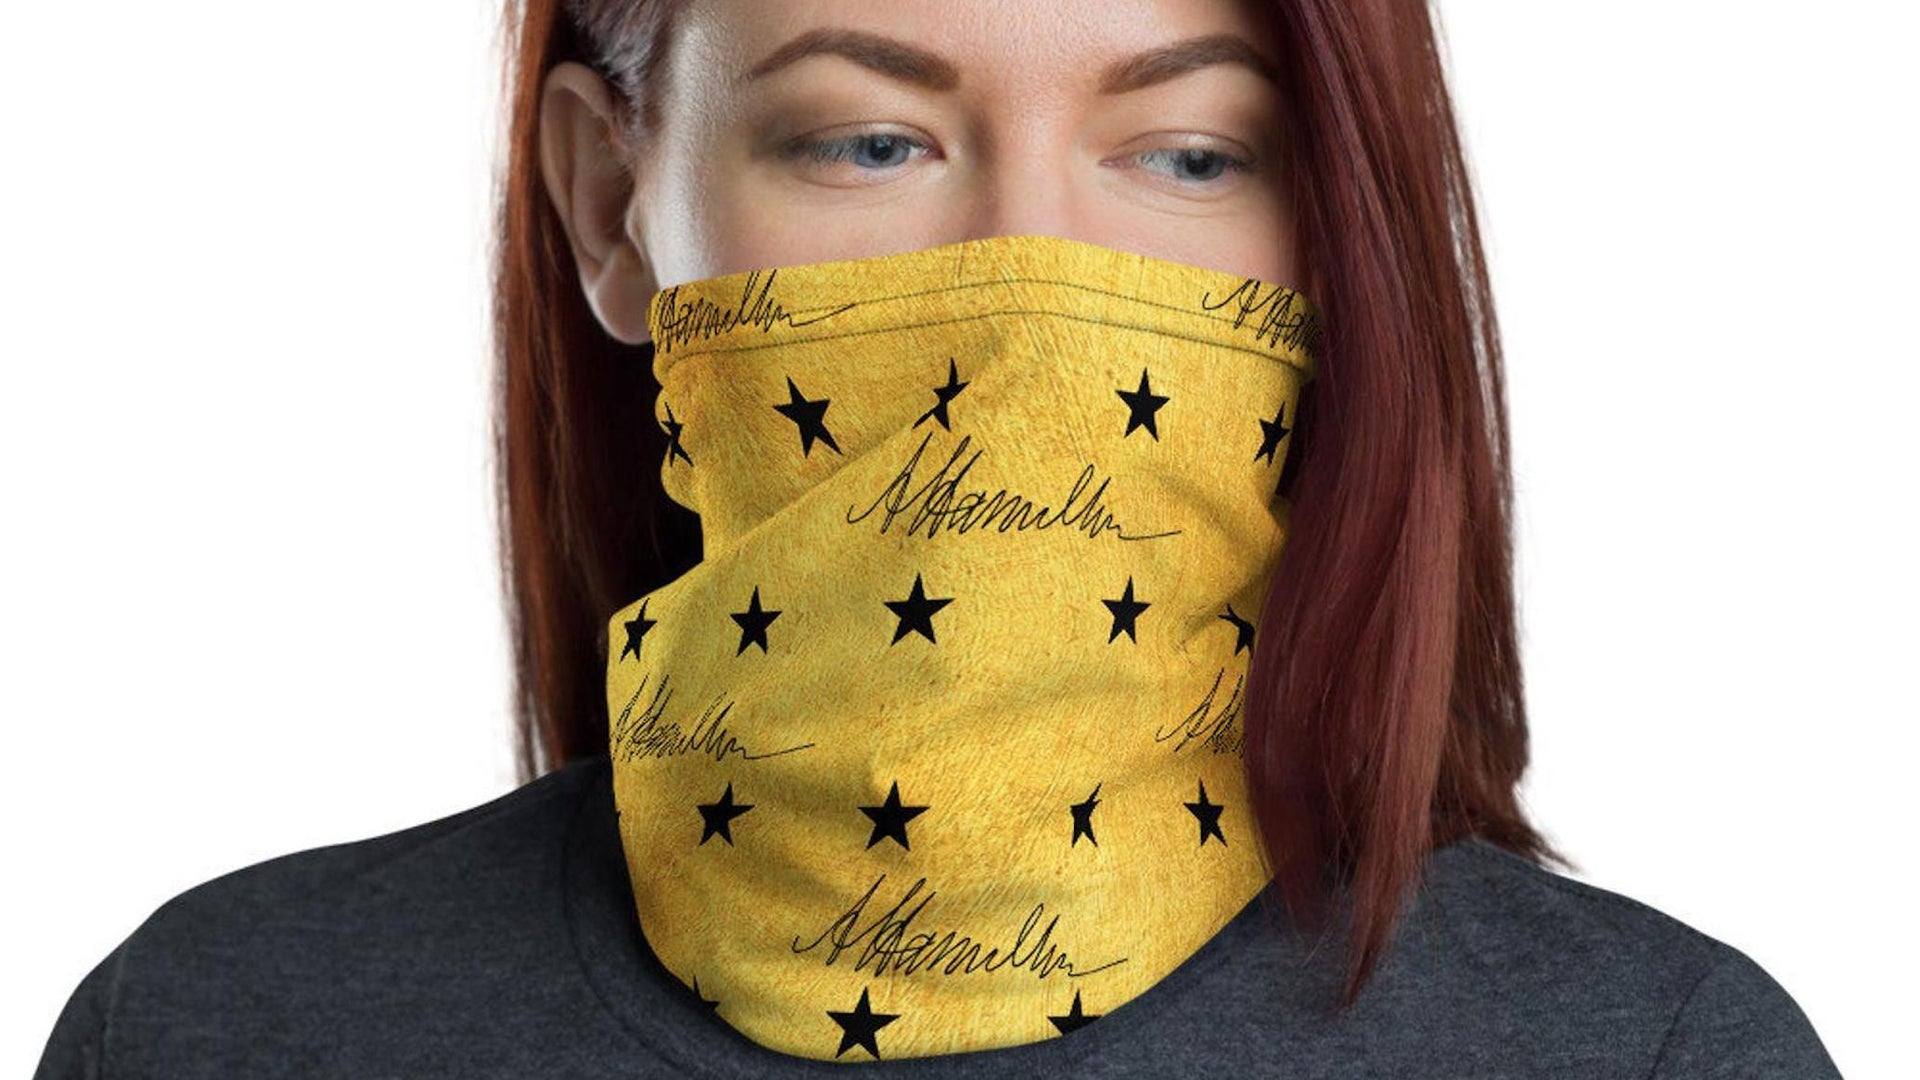 Hamilton Face Mask